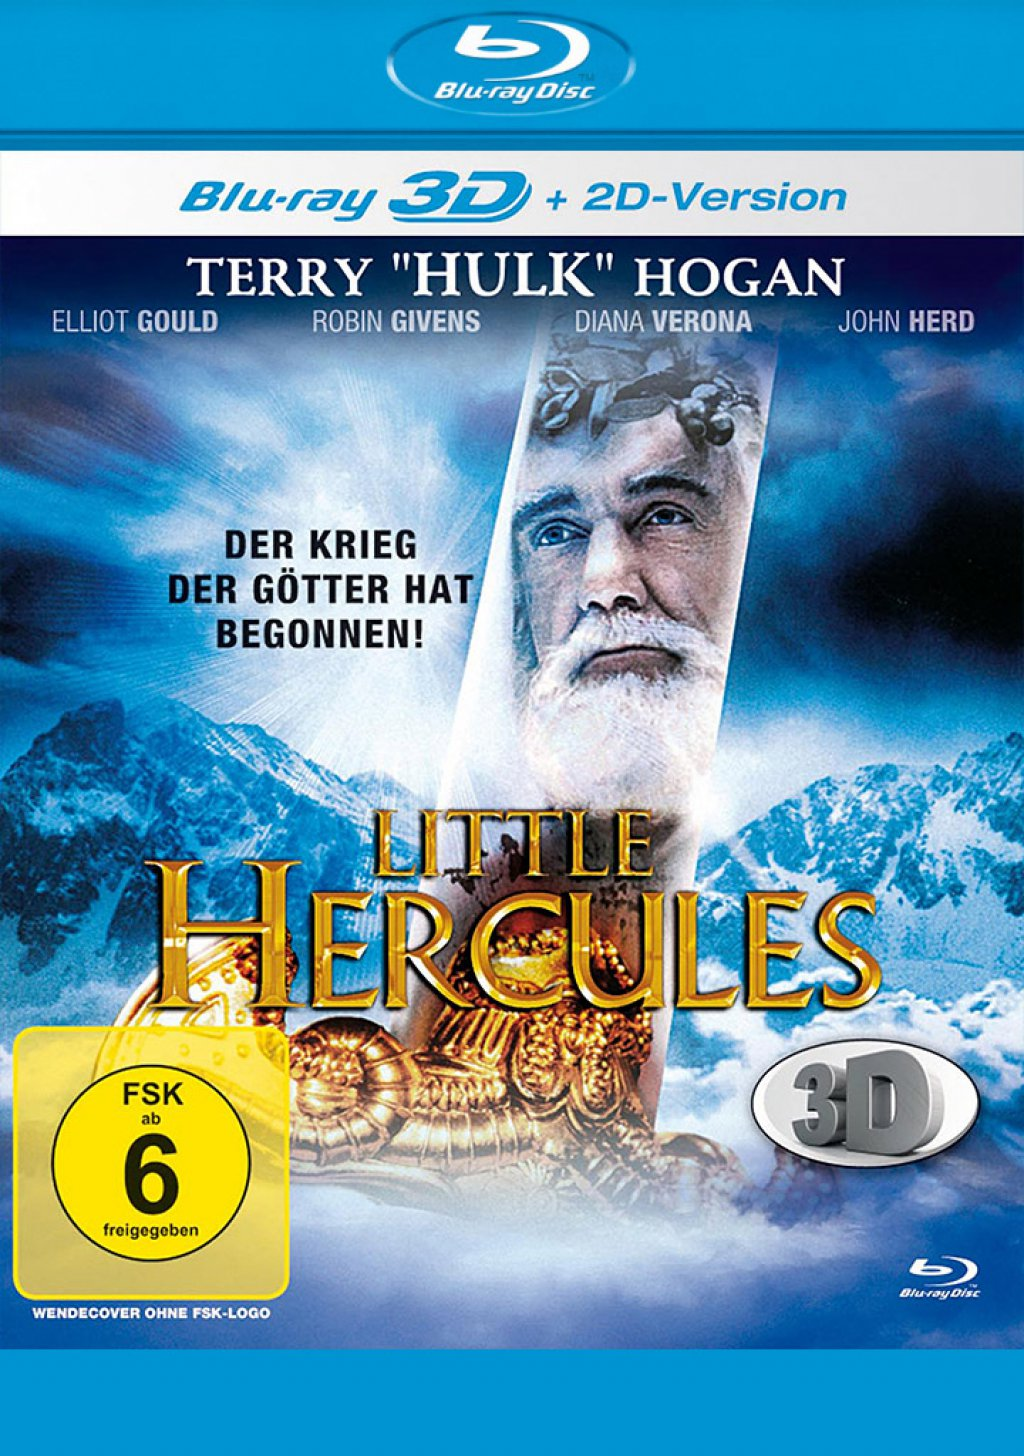 Little Hercules 3D - Blu-ray 3D + 2D (Blu-ray)